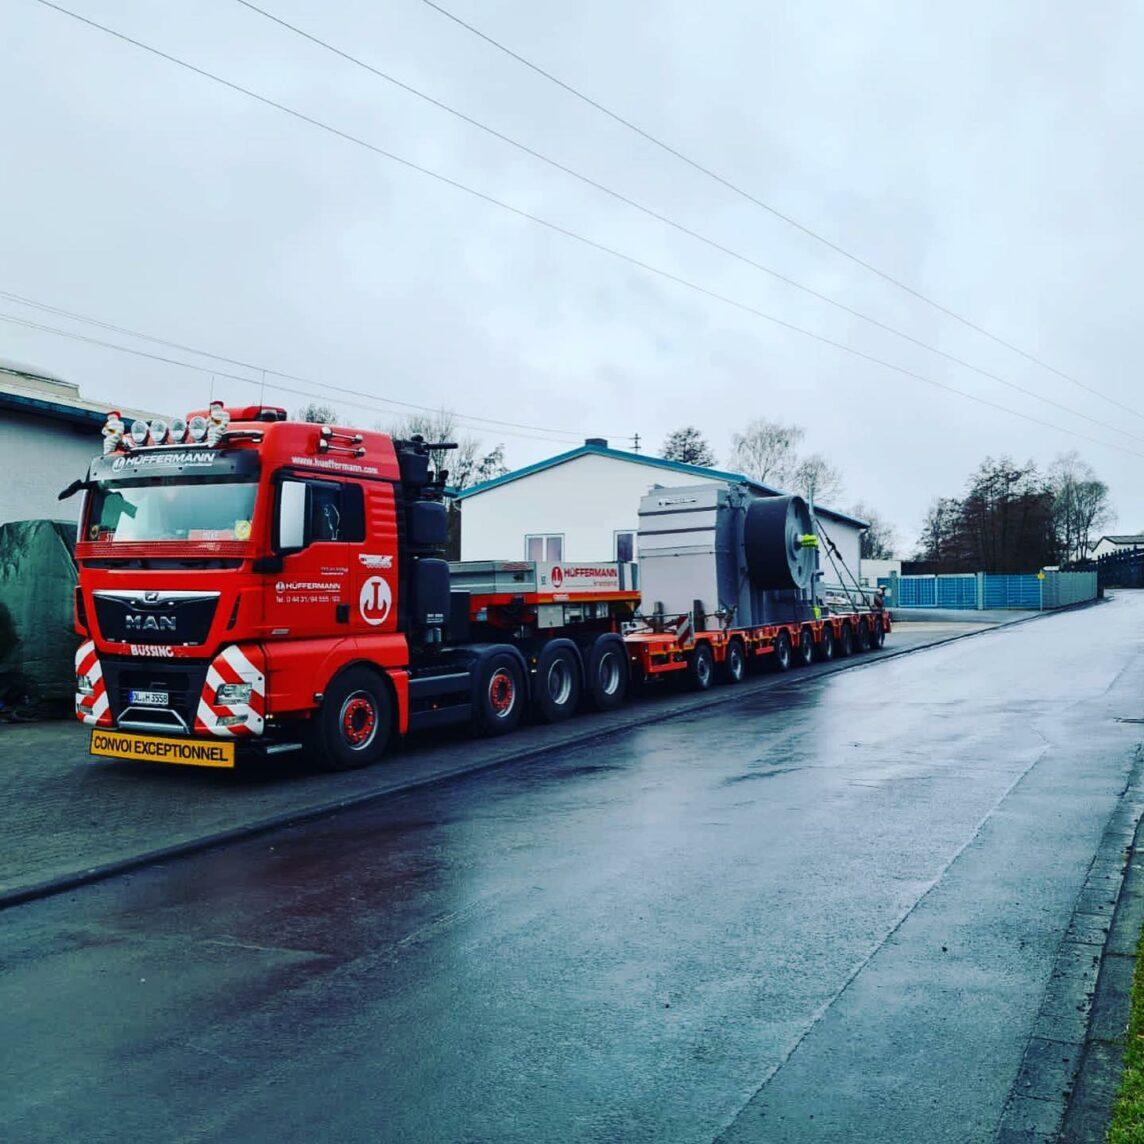 Genehmigungsservice - Begleitfahrzeug - Transport - Hüffermann